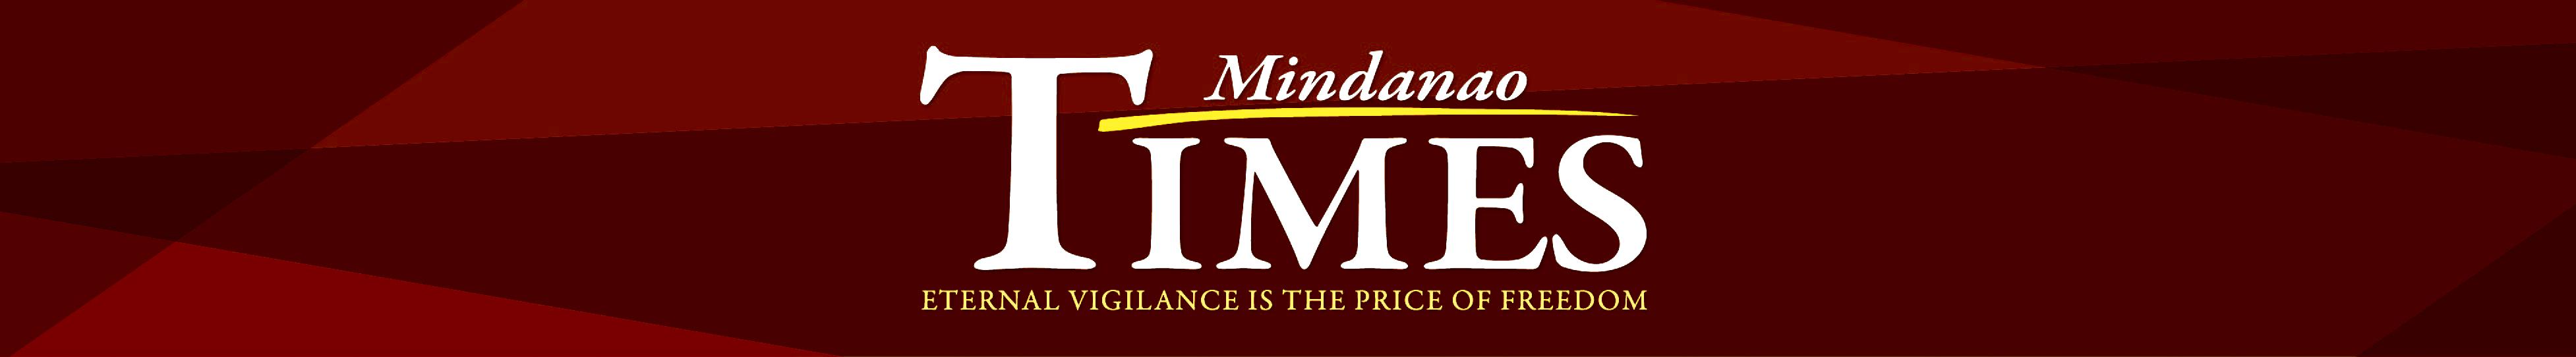 Mindanao Times